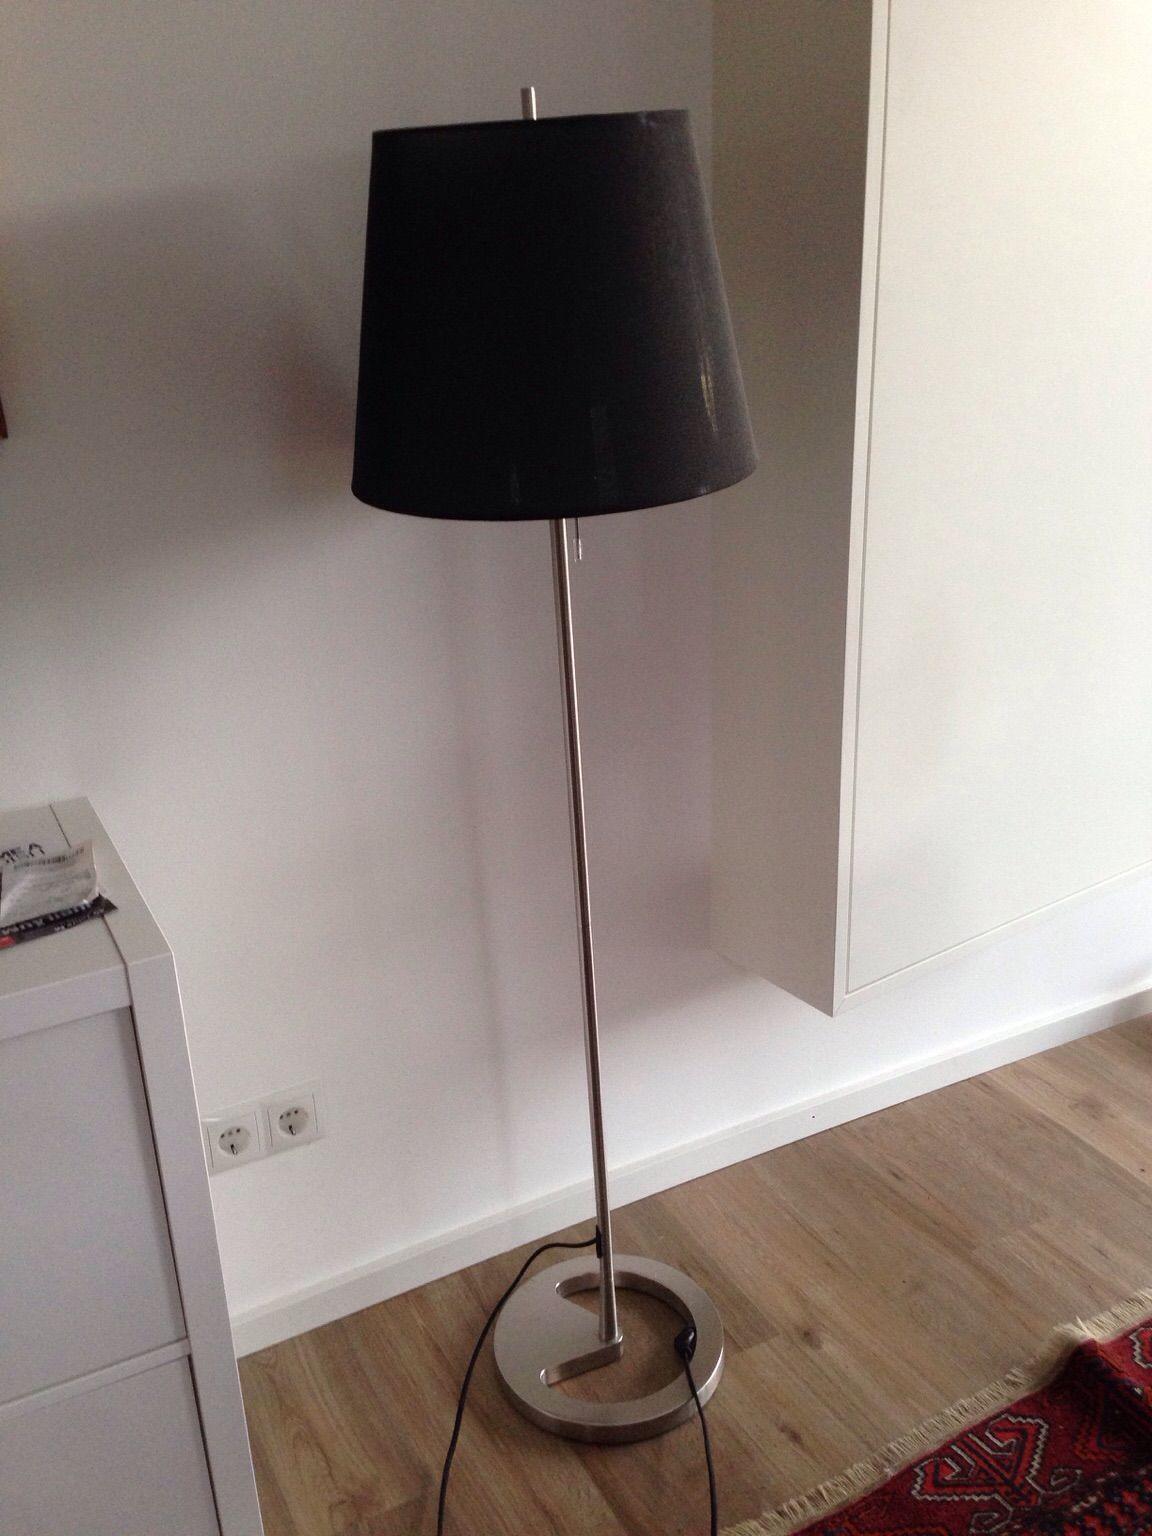 Full Size of Stehlampen Ikea Dimmbar Led Stehlampe Lampenschirm Wohnzimmer Schweiz Lampe Papier Lampen Schirm Bogenlampe Inspirierend Kaufenkosmetiklampe Bilder Betten Wohnzimmer Stehlampen Ikea